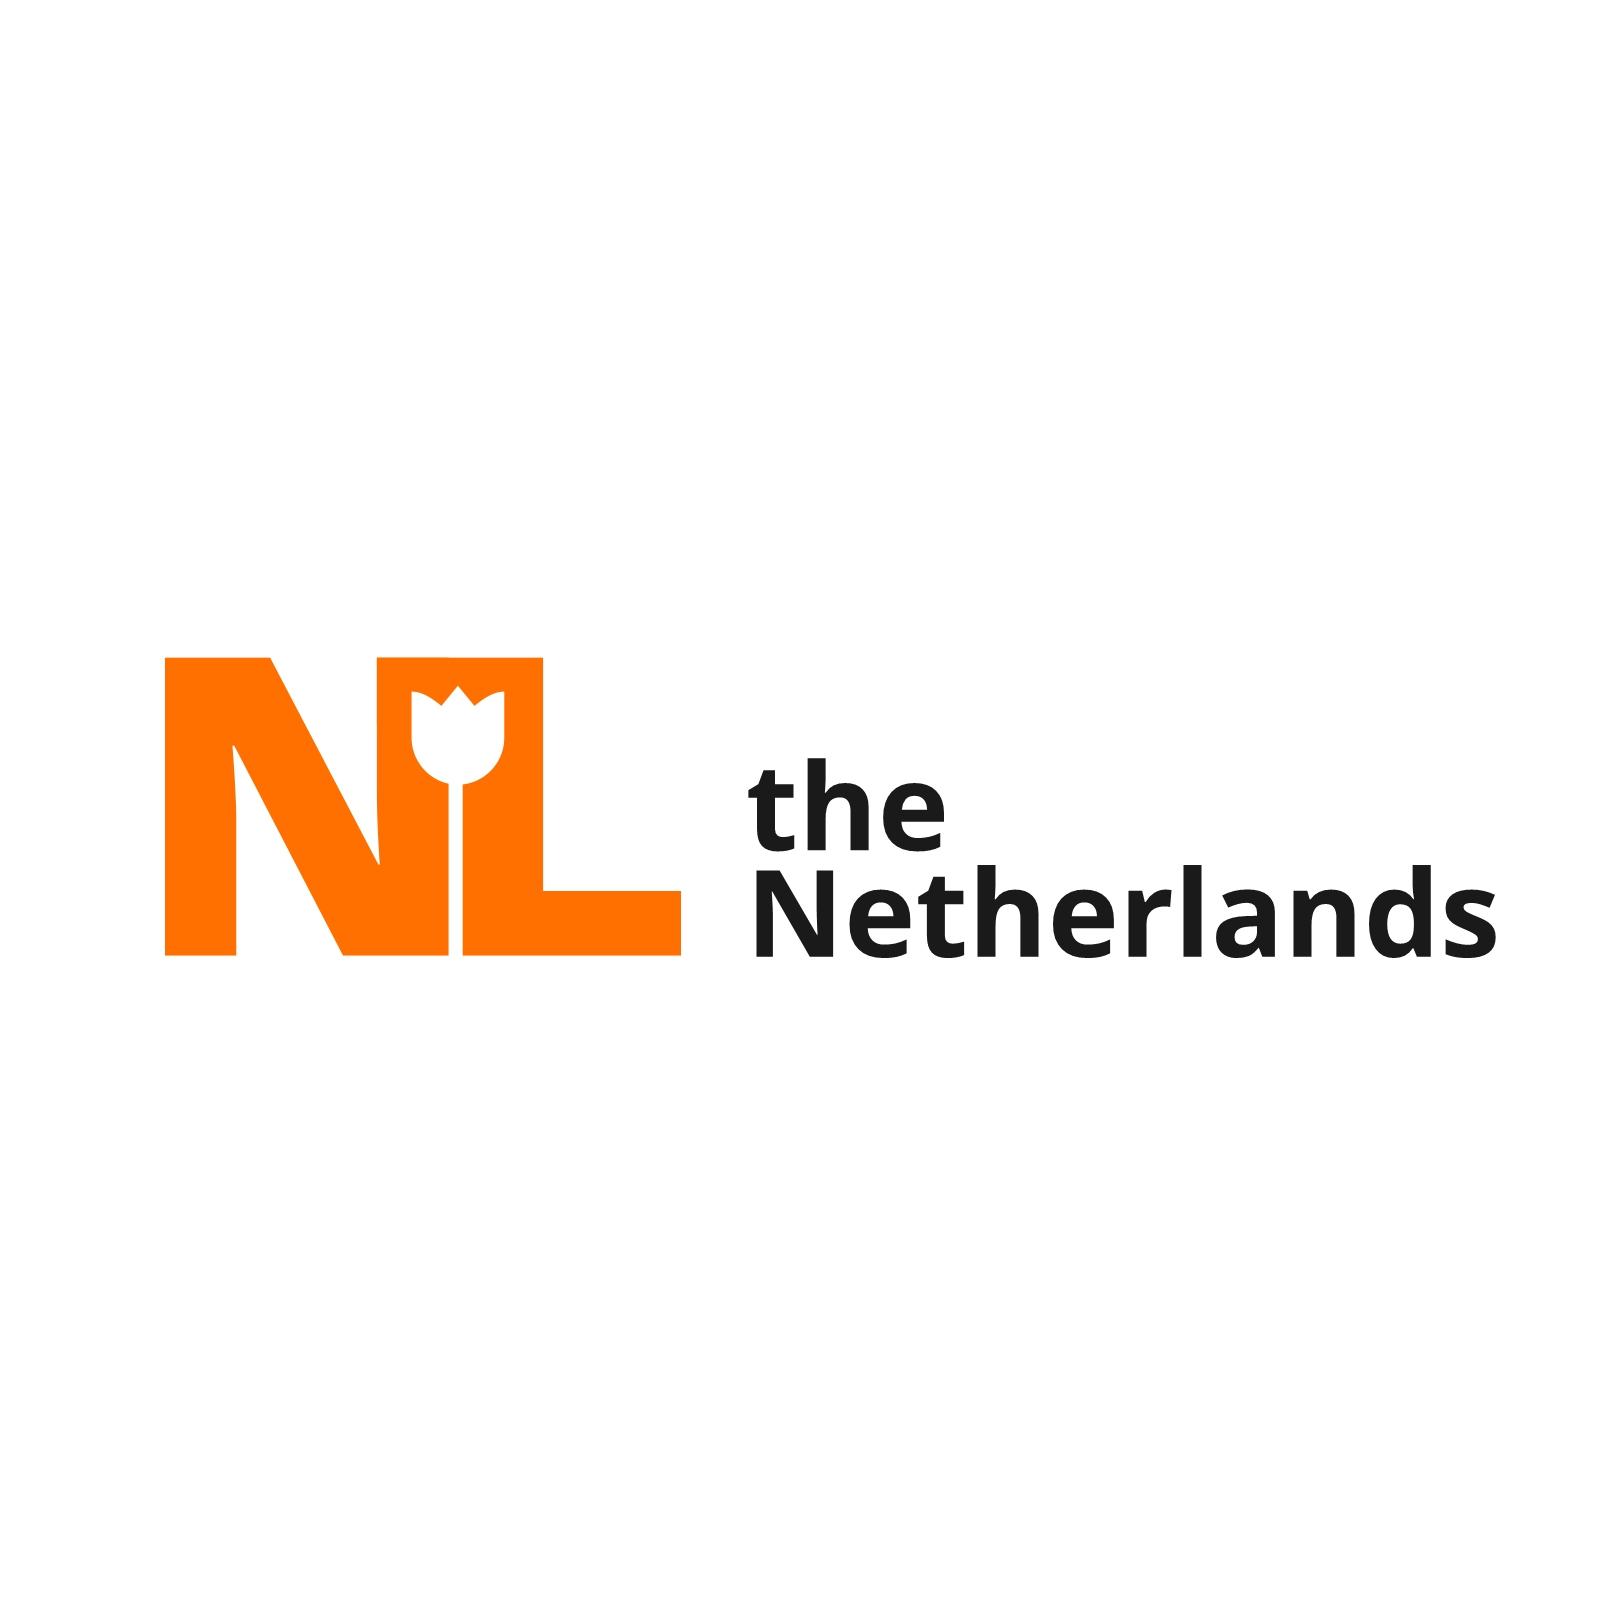 The-Netherlands-logo-option-2